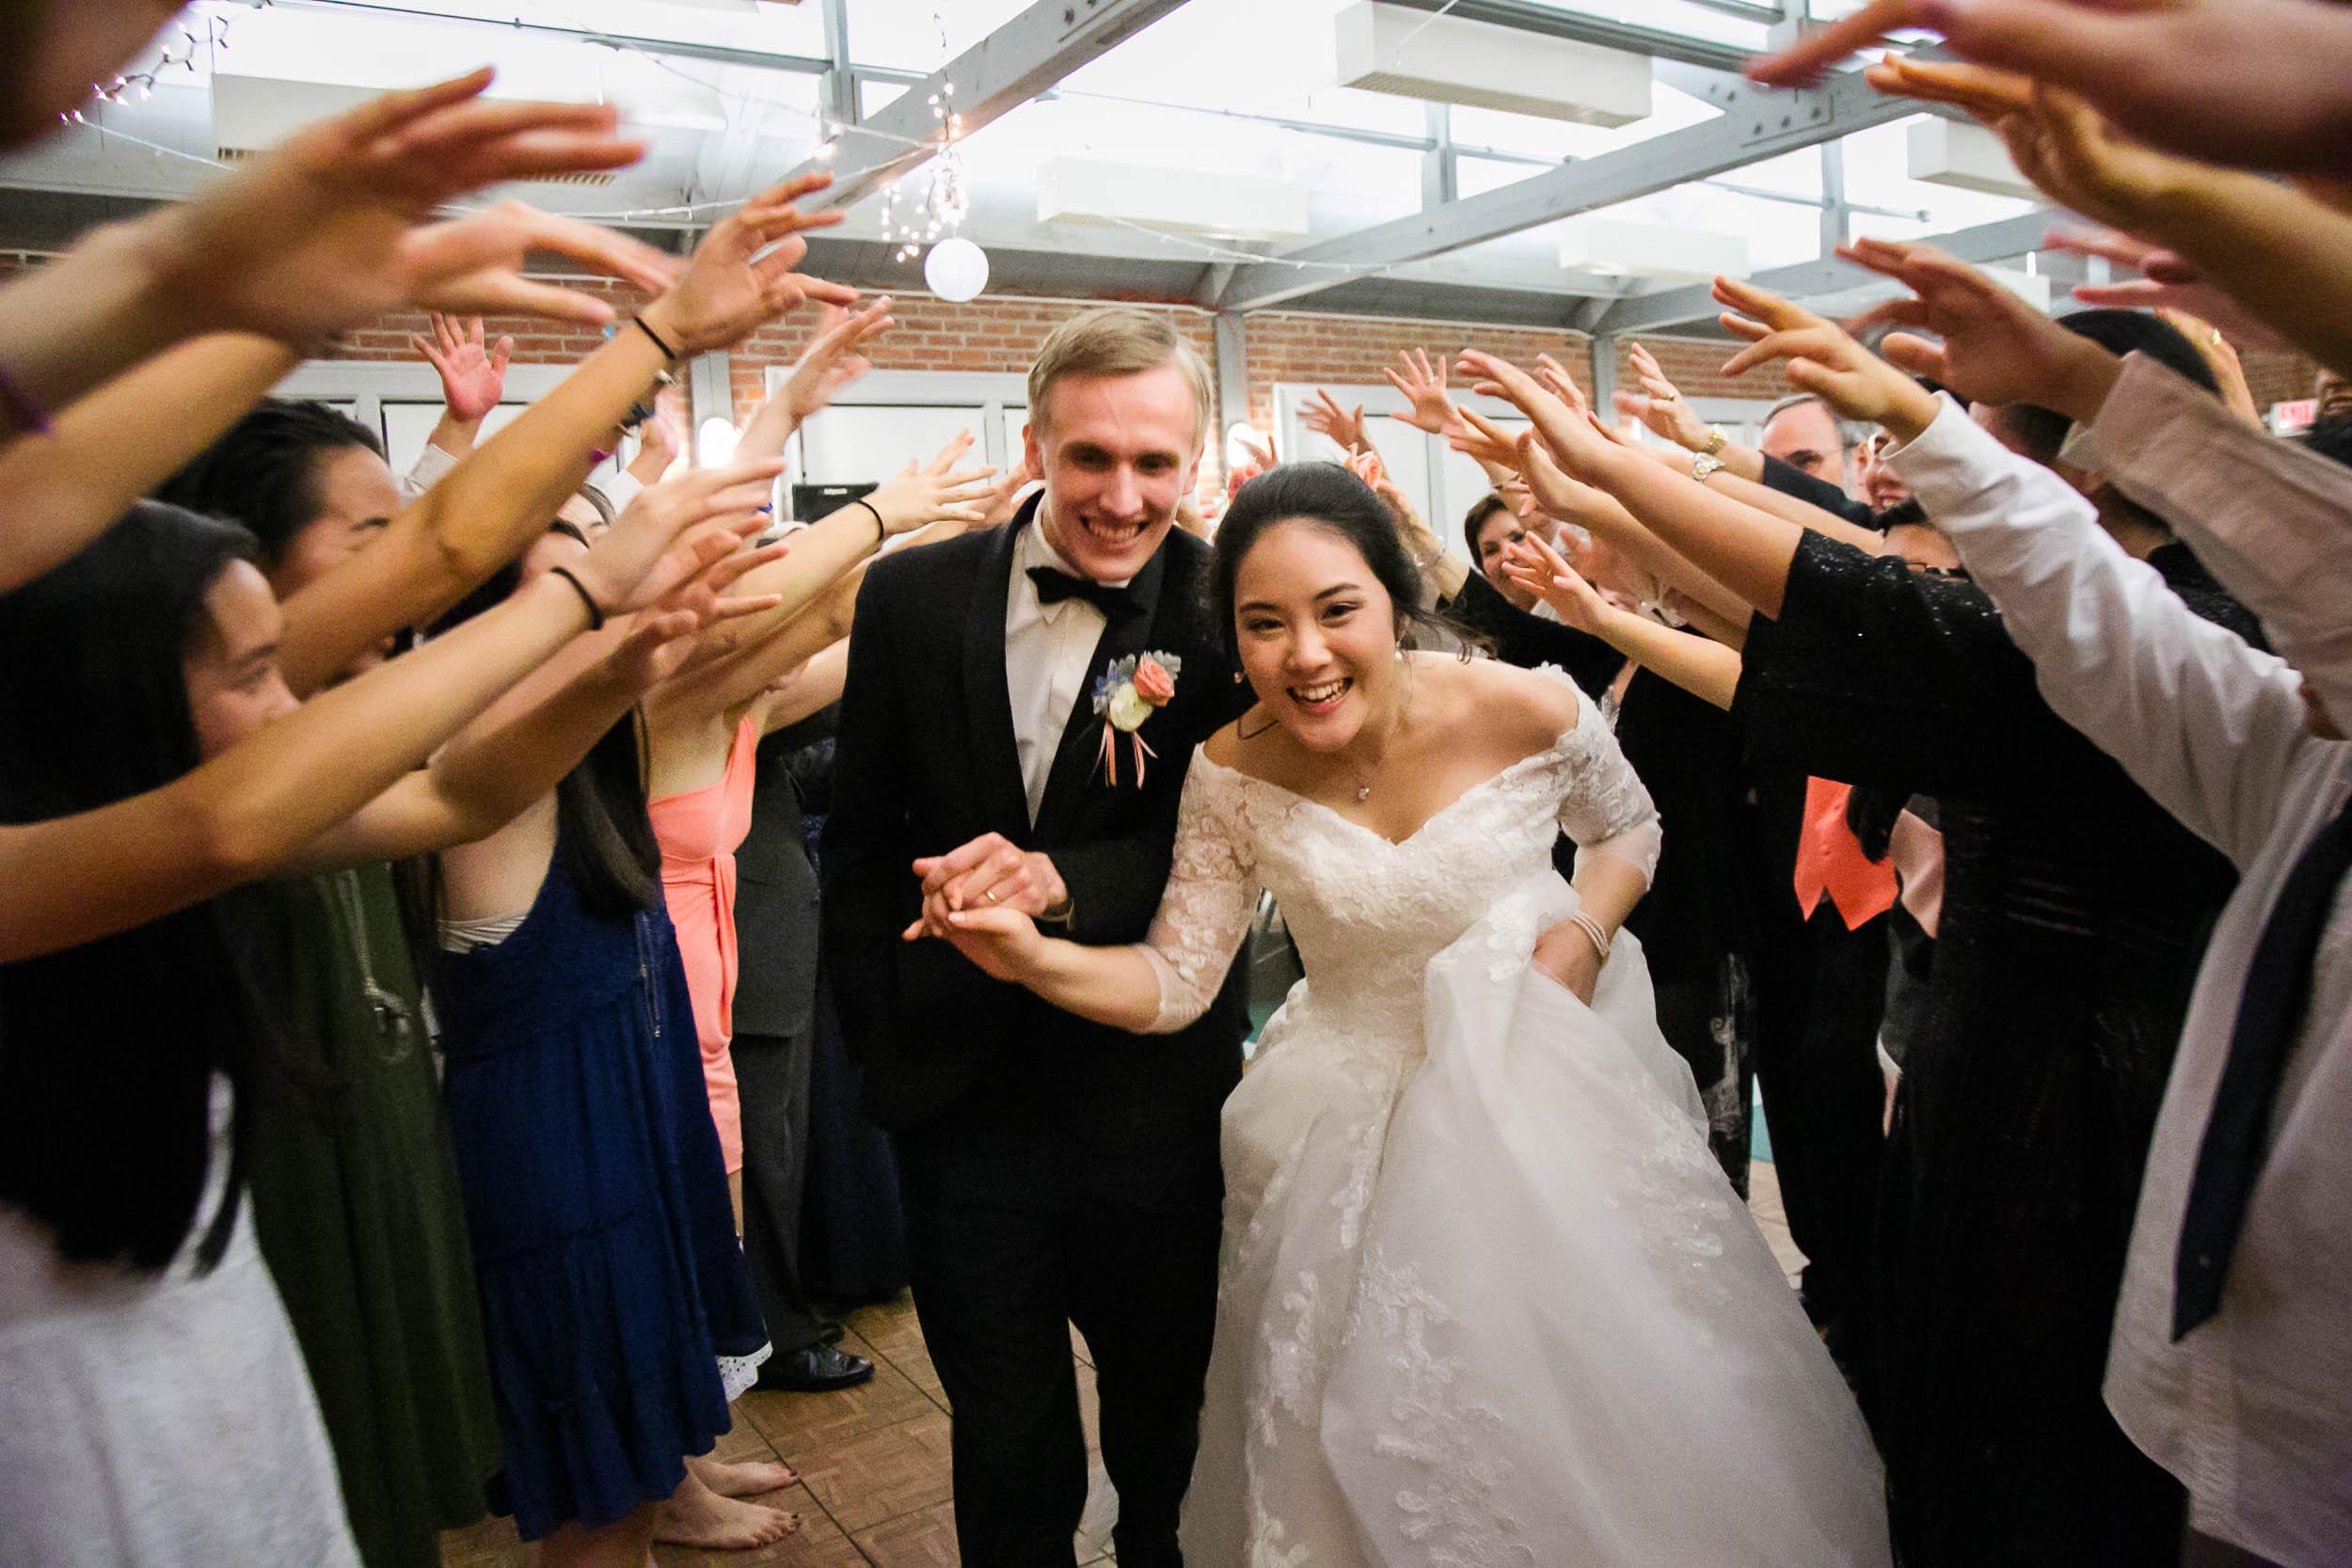 Raleigh Wedding Photographer | G. Lin Photography | Bride and groom exiting wedding